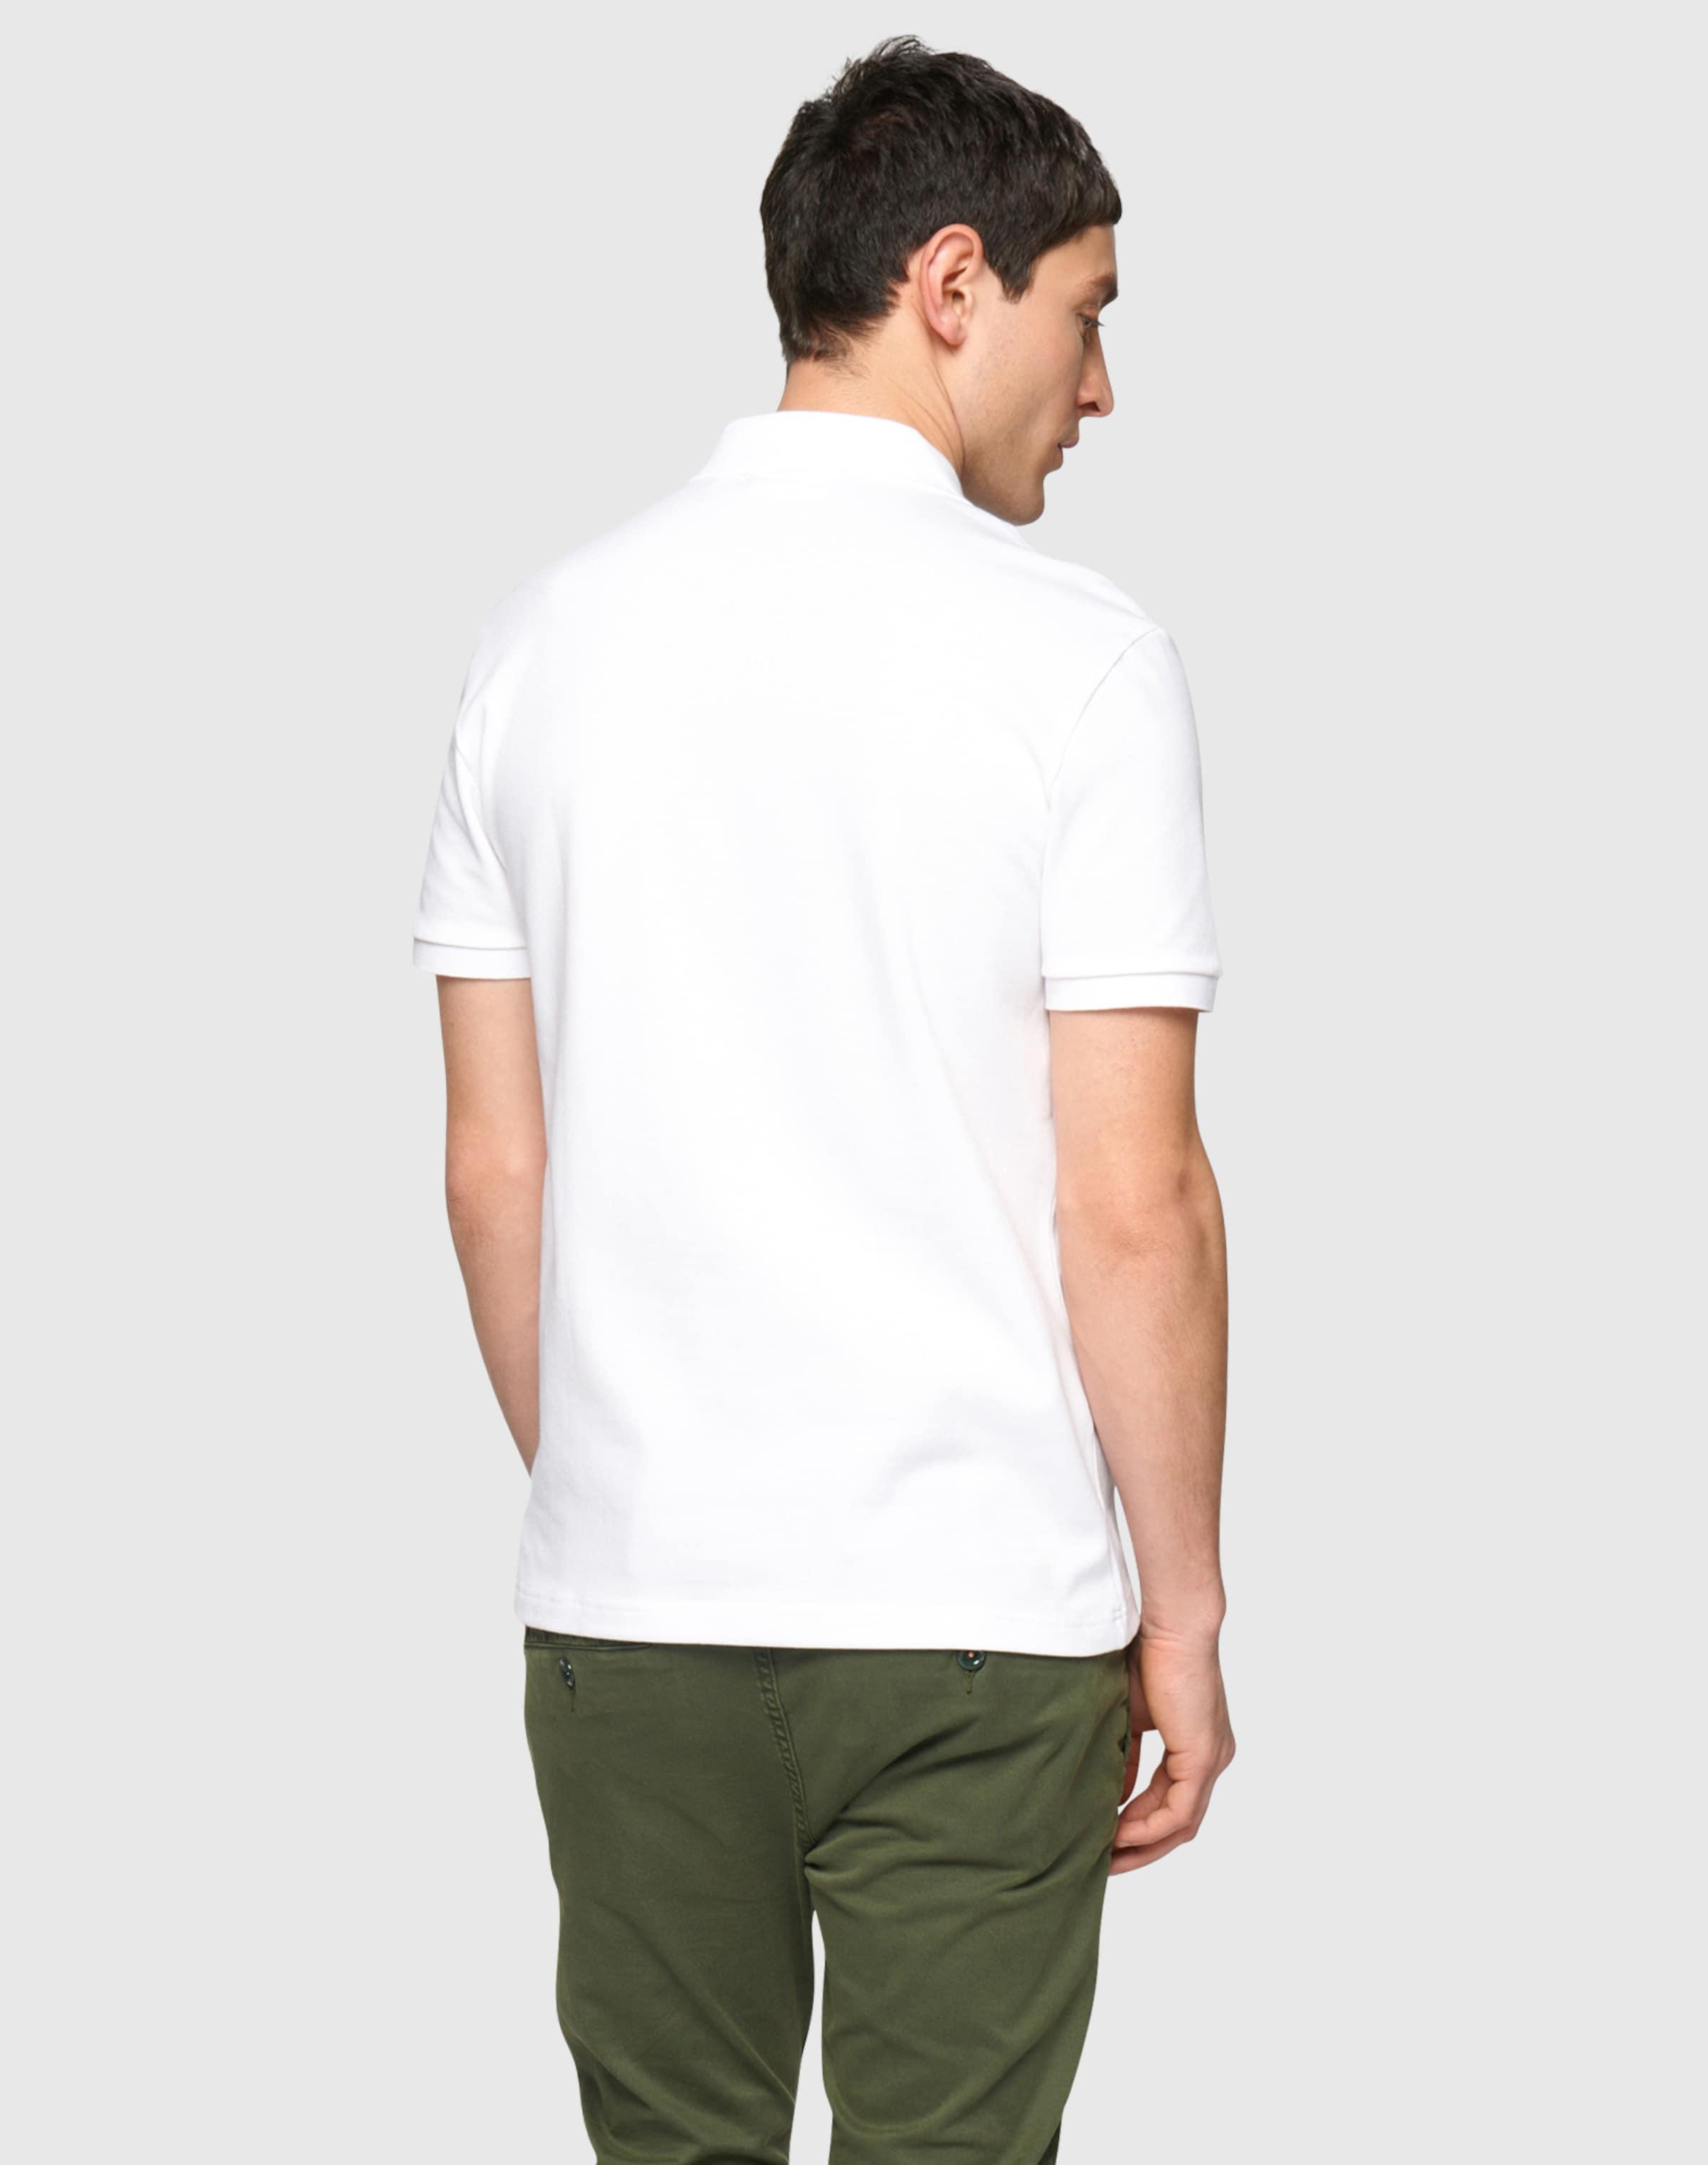 shirt Noir Noir En Lacoste Lacoste T En T shirt Y7bIgy6vfm